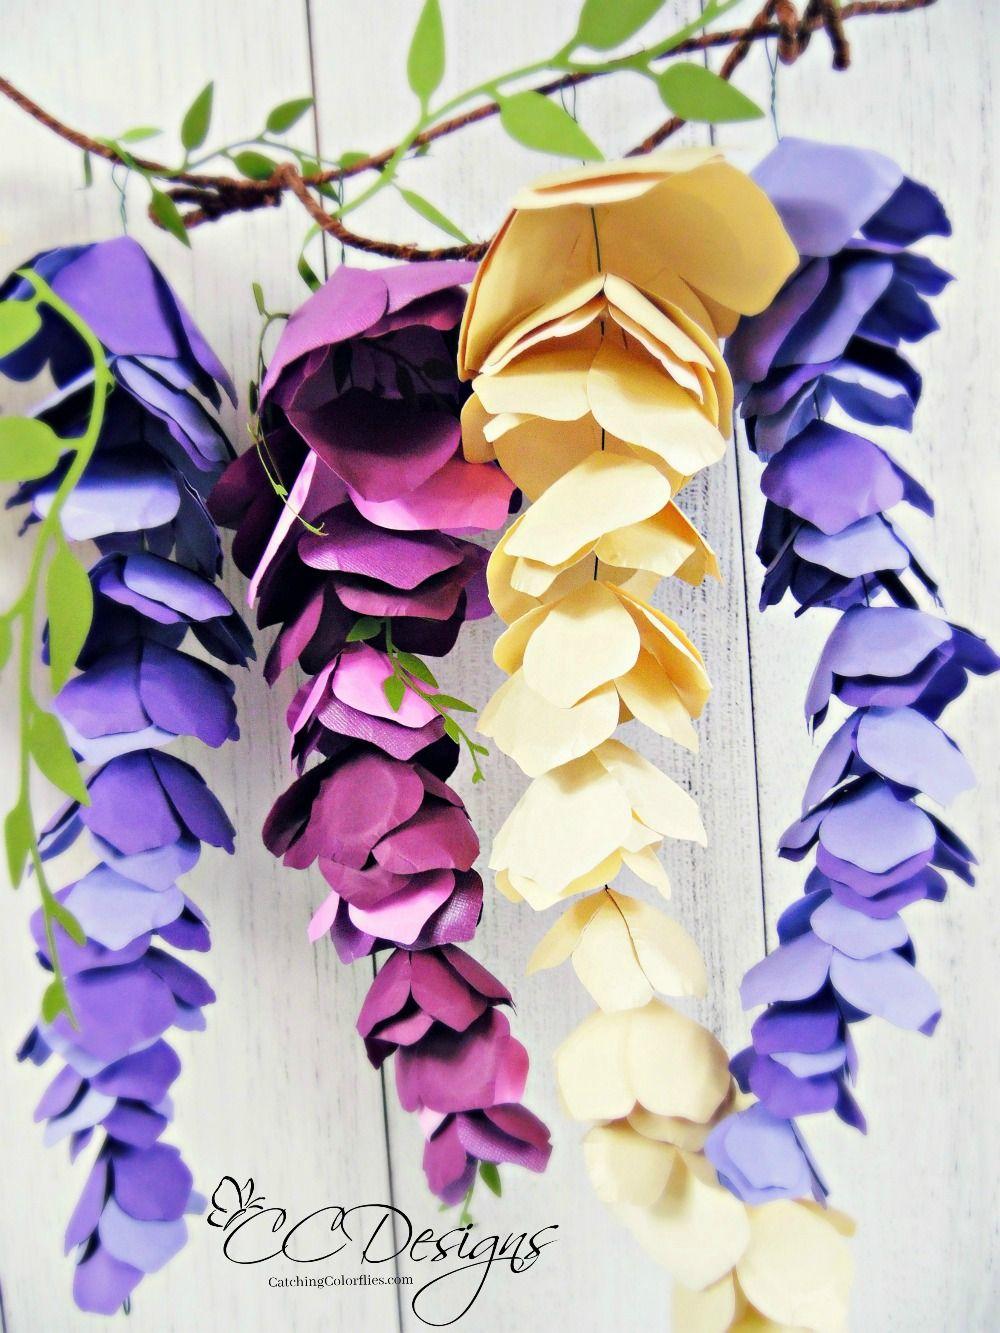 Paper Wisteria Tutorial Diy Hanging Paper Wisteria Flowers Paper Flowers Paper Flower Tutorial Paper Flowers Diy